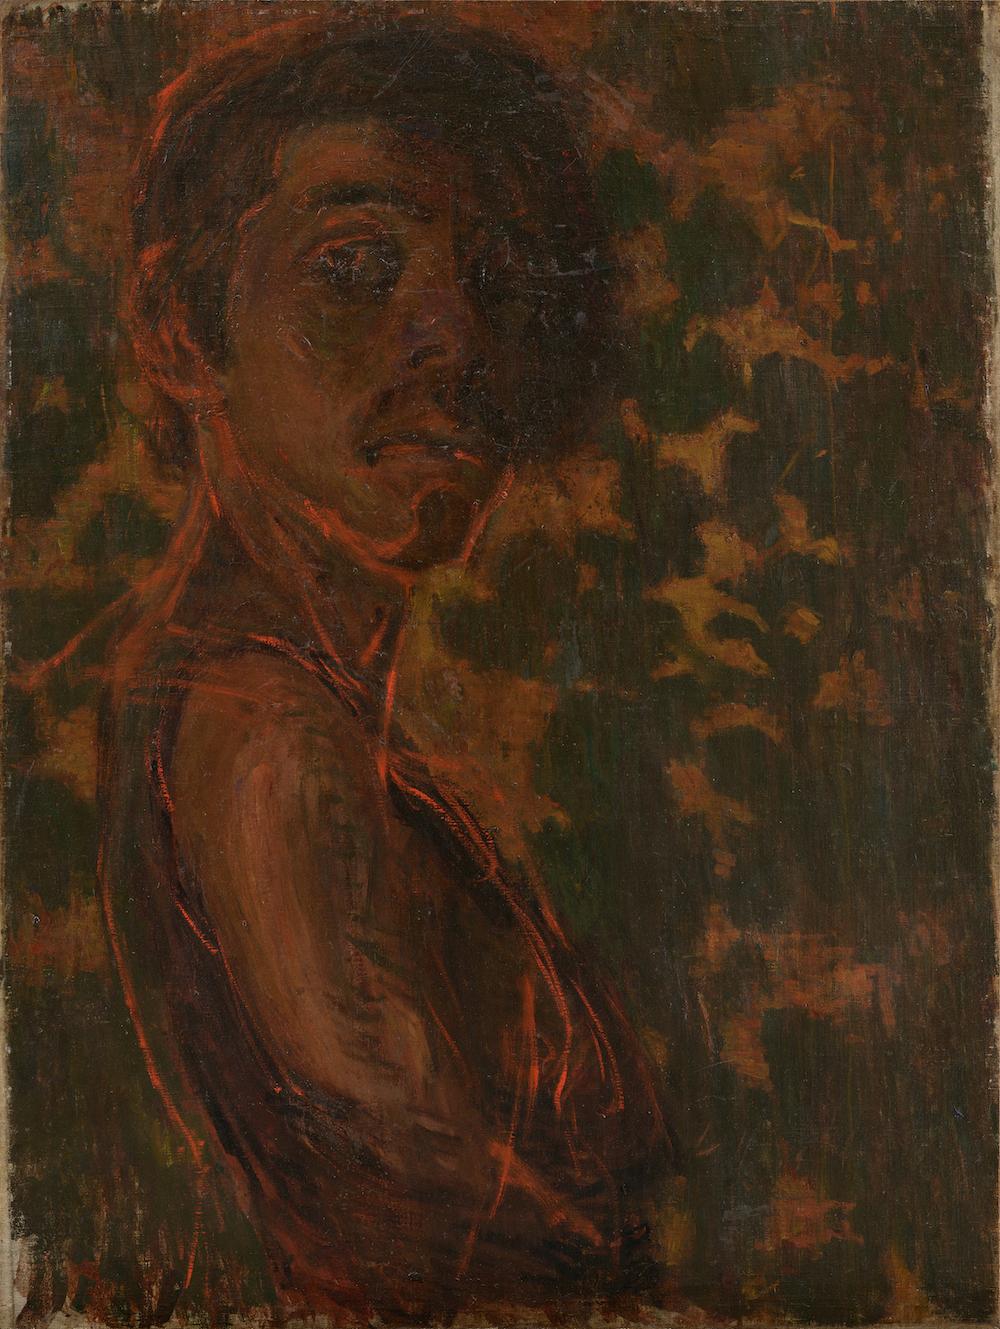 AOKI Shigeru《Self-Portrait》 1903, the Artizon Museum, Ishibashi Foundation Collection